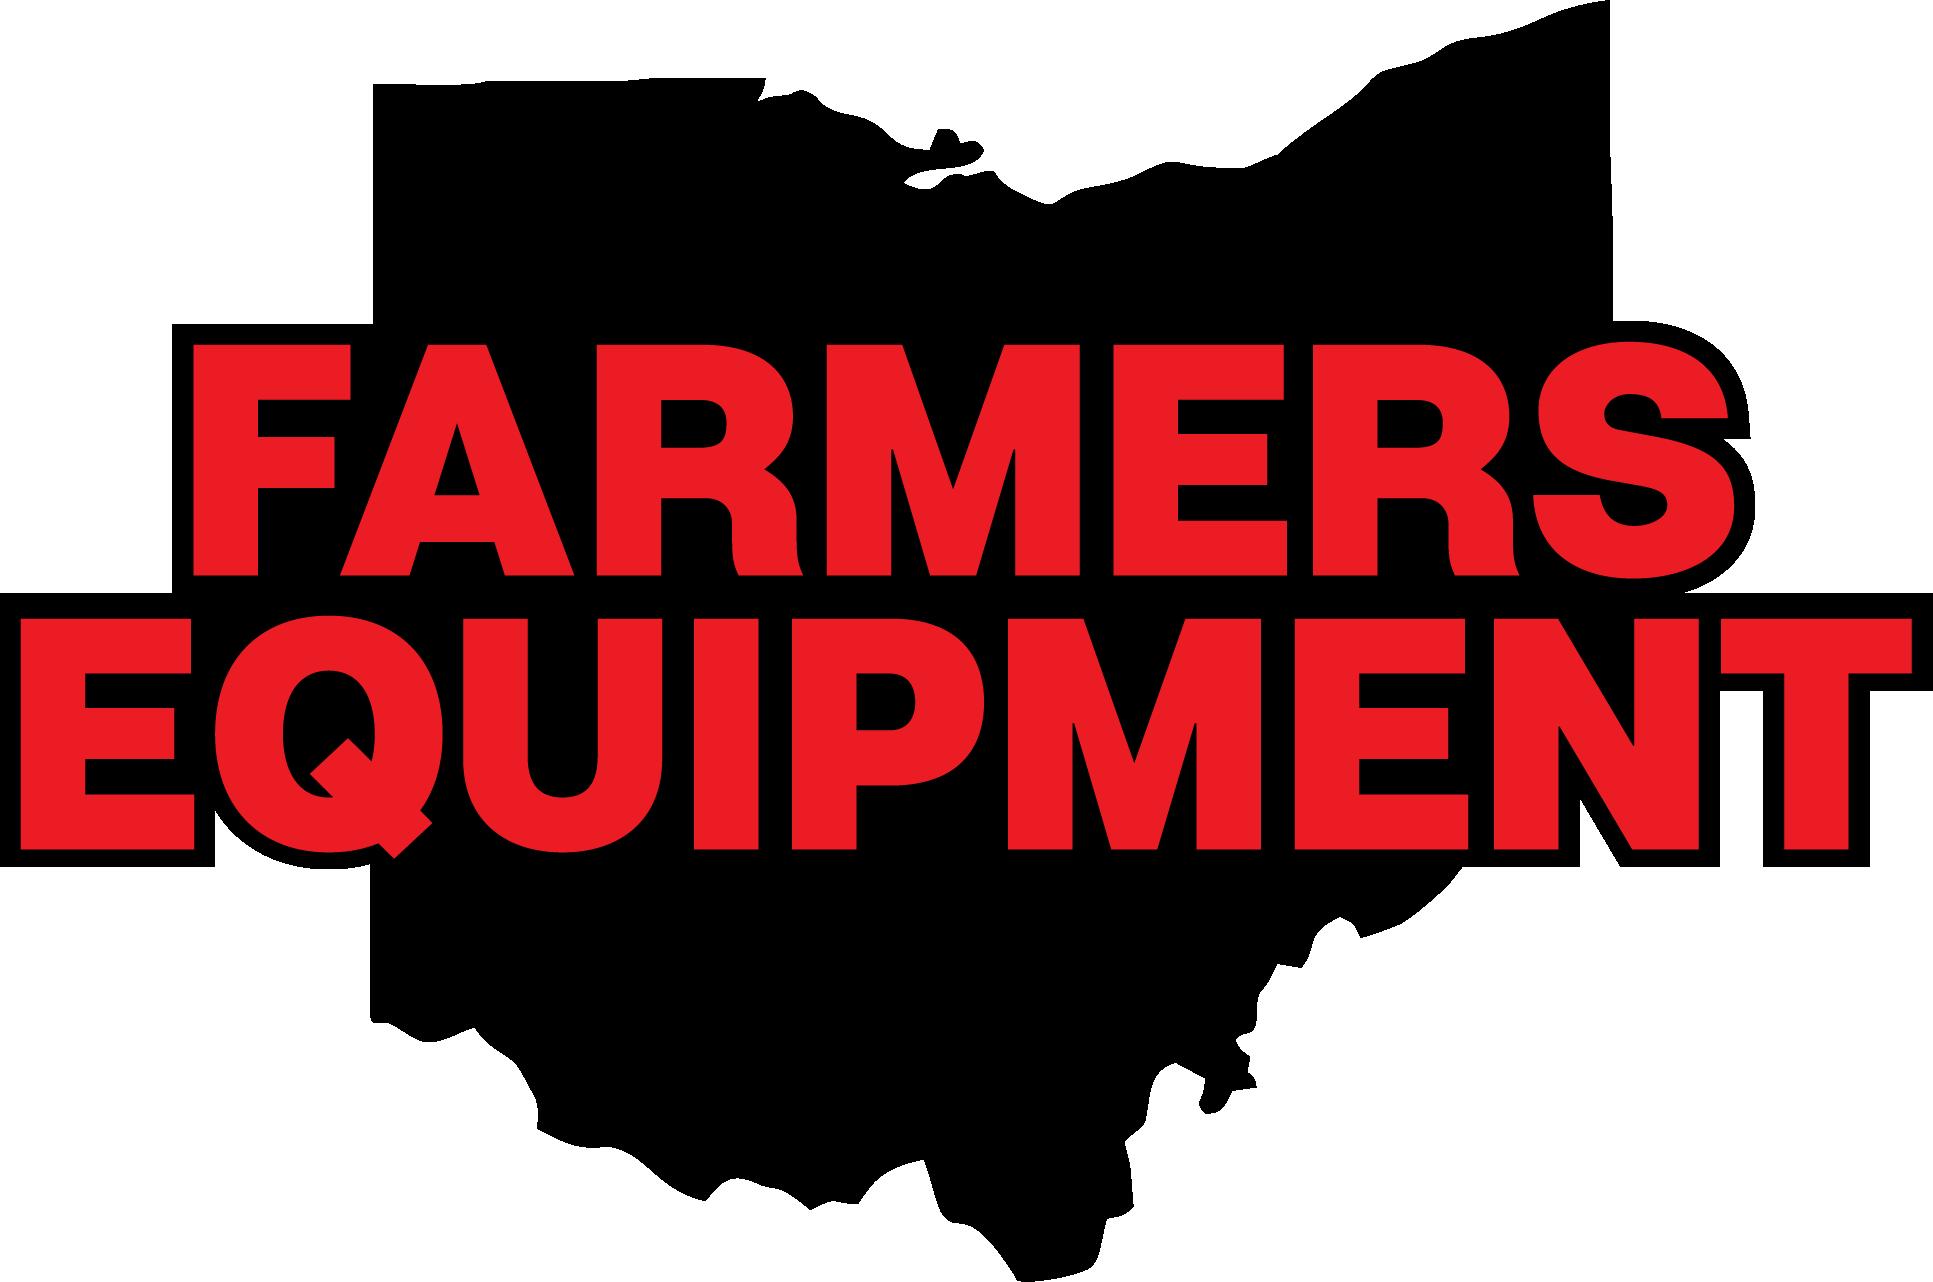 Farmers Equipment